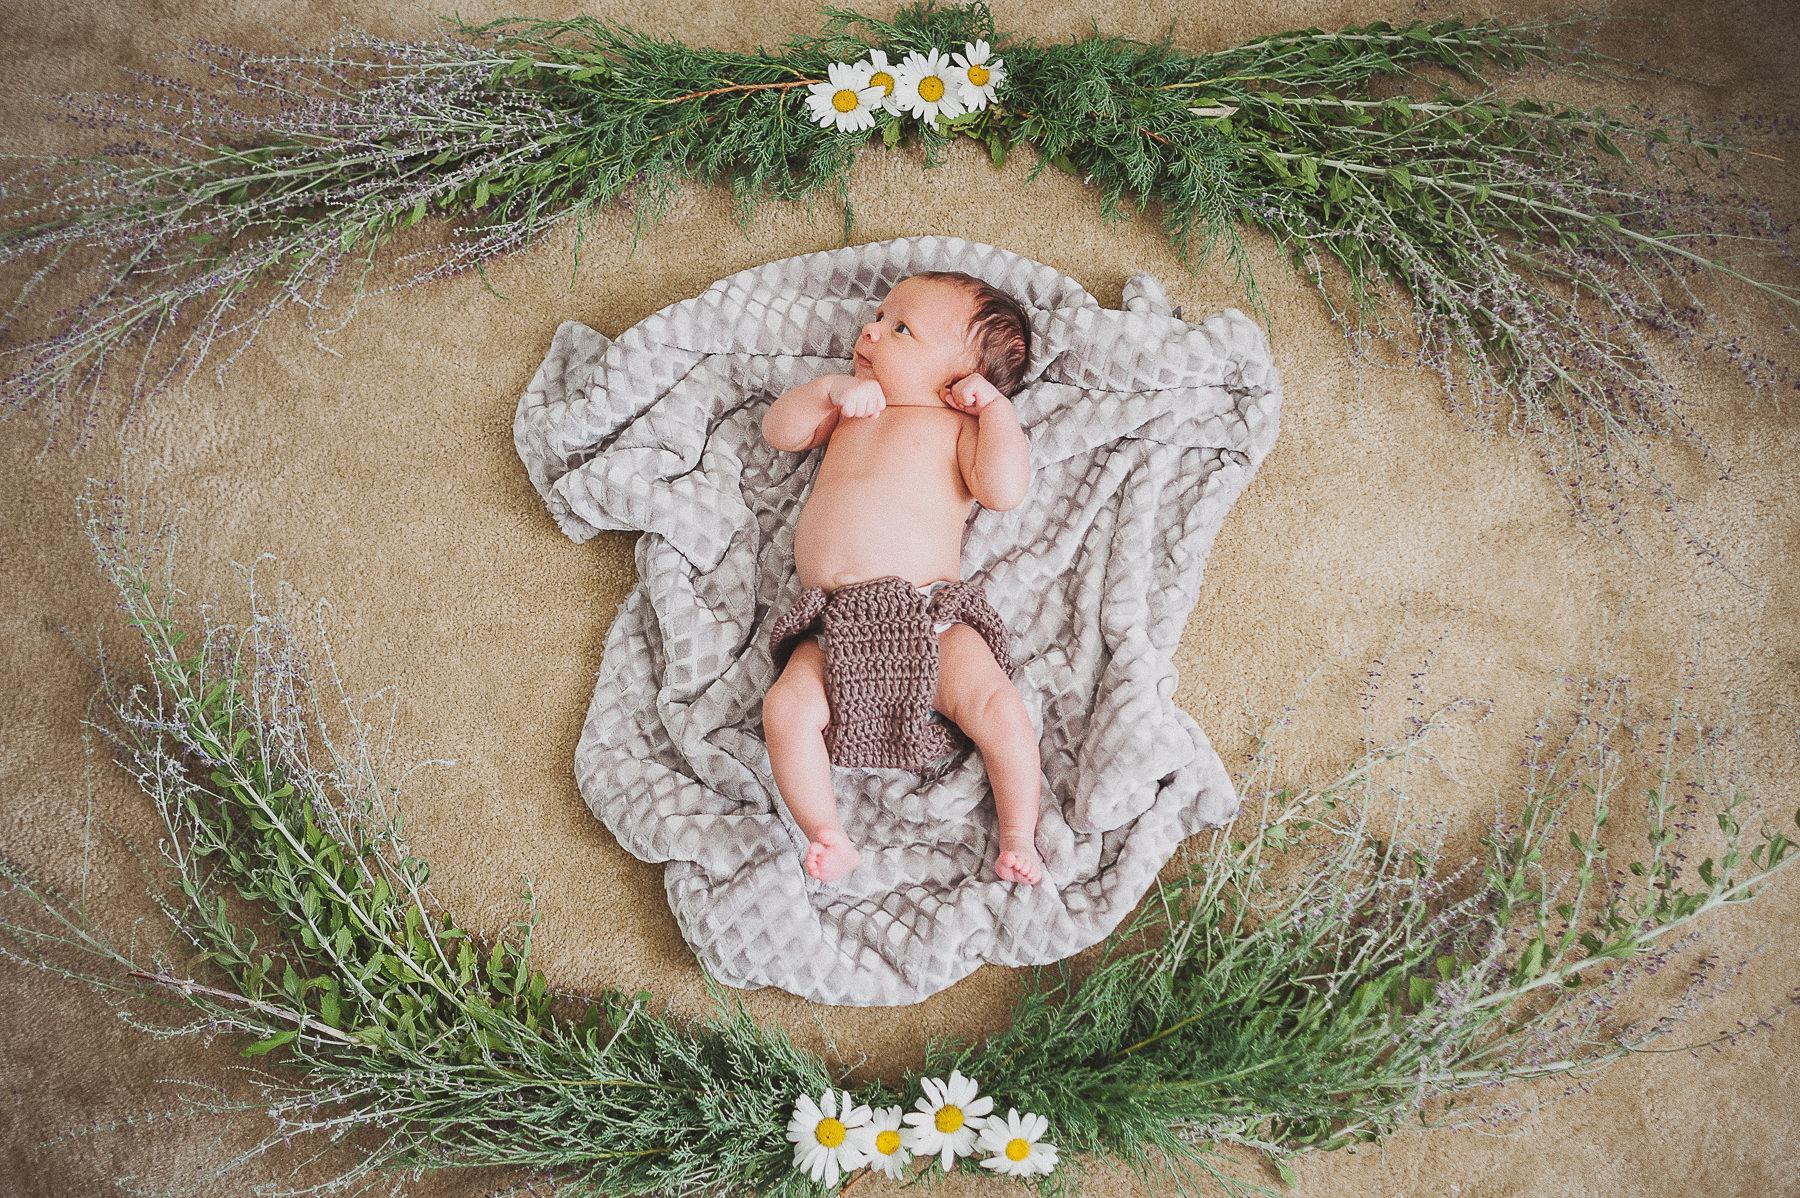 breighton-and-basette-photography-copyrighted-image-blog-arlo-newborn-003.jpg